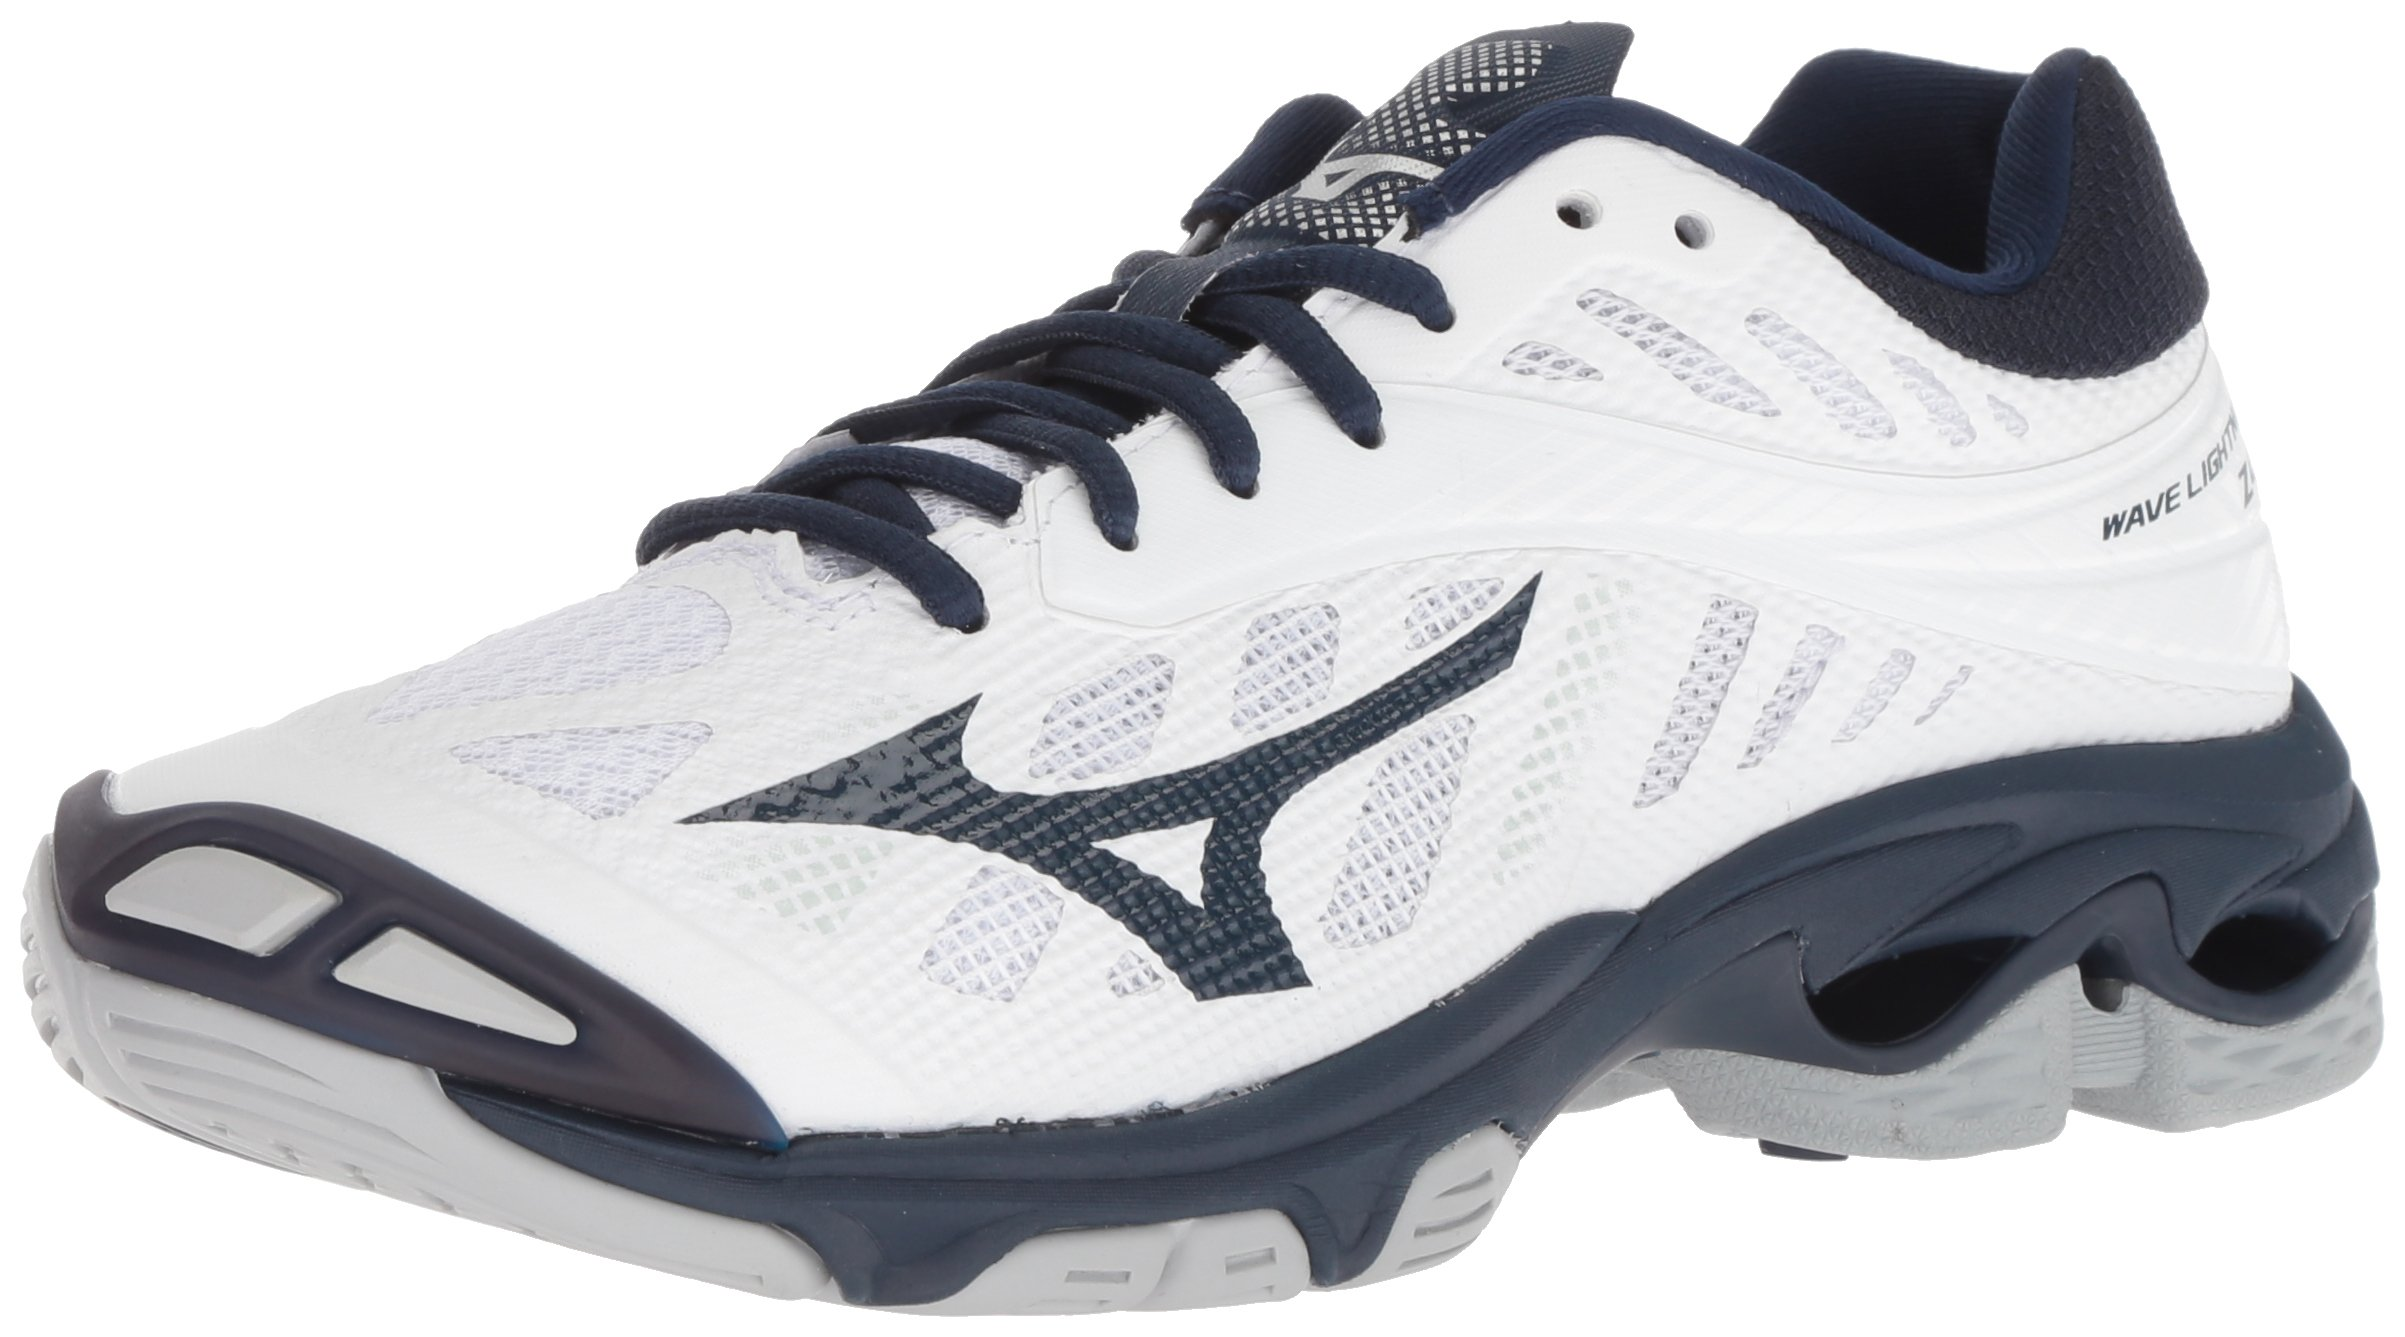 Mizuno Wave Lightning Z4 Volleyball Shoes, White/Navy Women's 6 B US